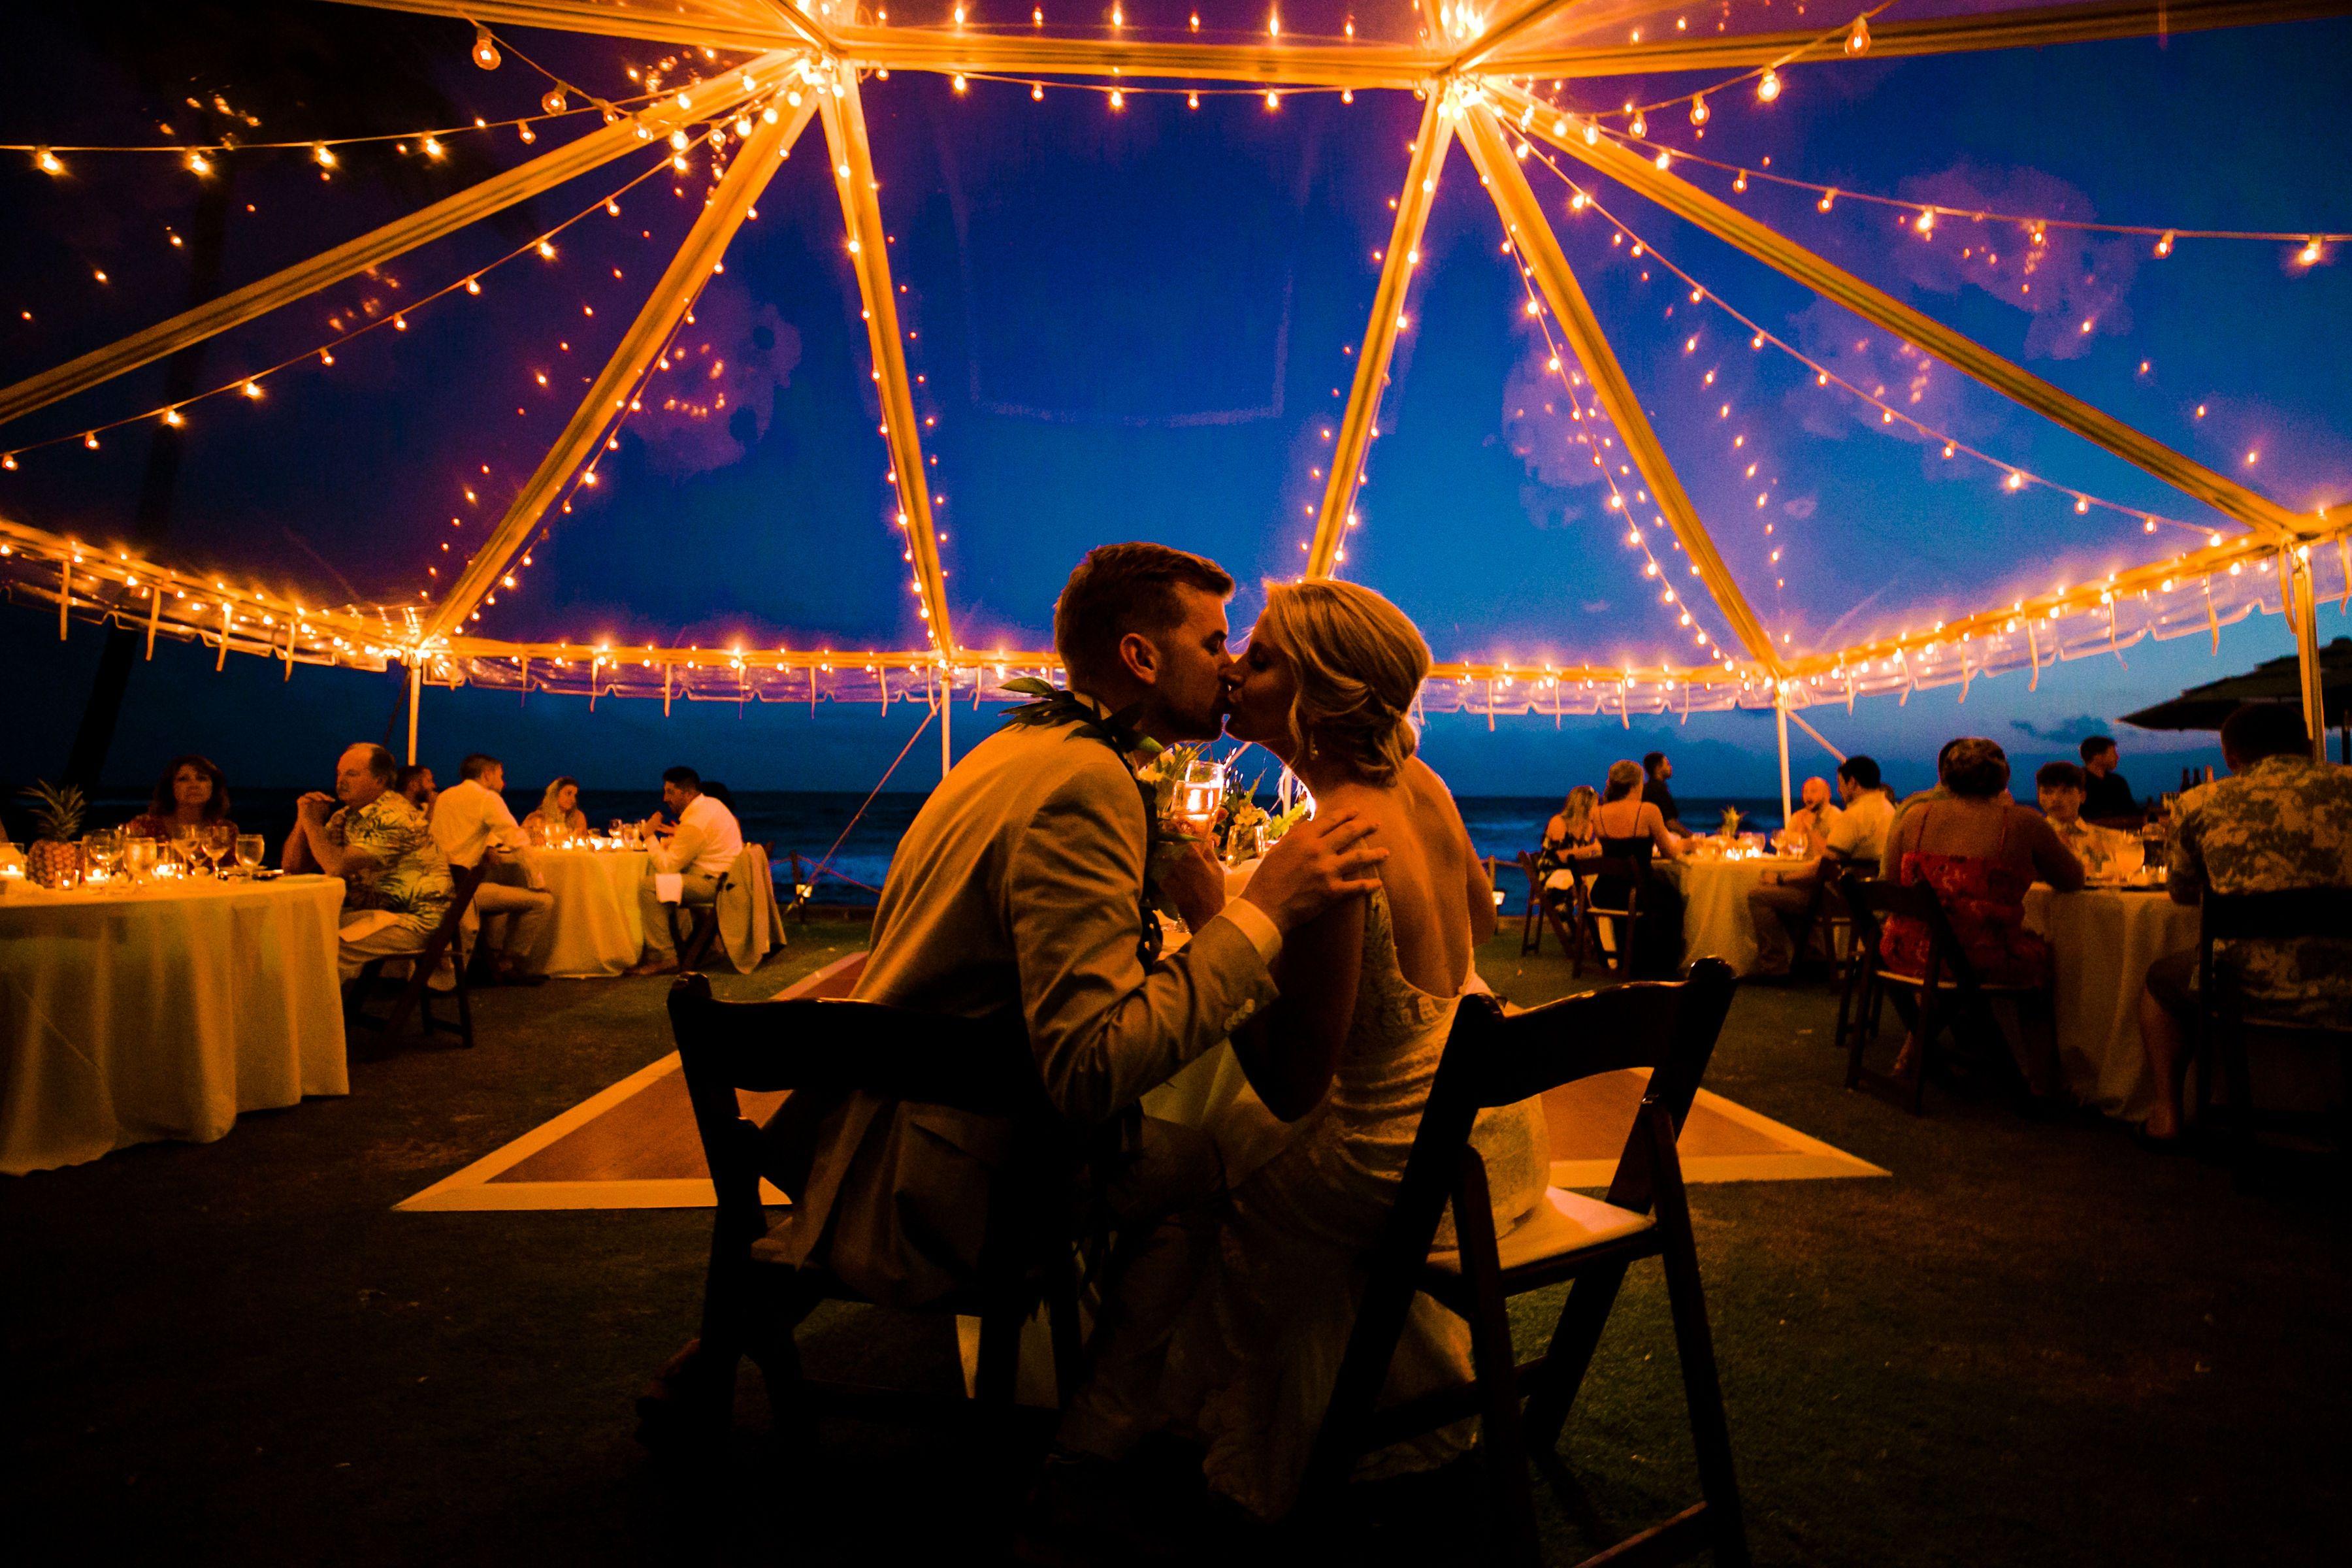 Clear Tent 40 Guests Destination Hawaii Wedding Dj Dance